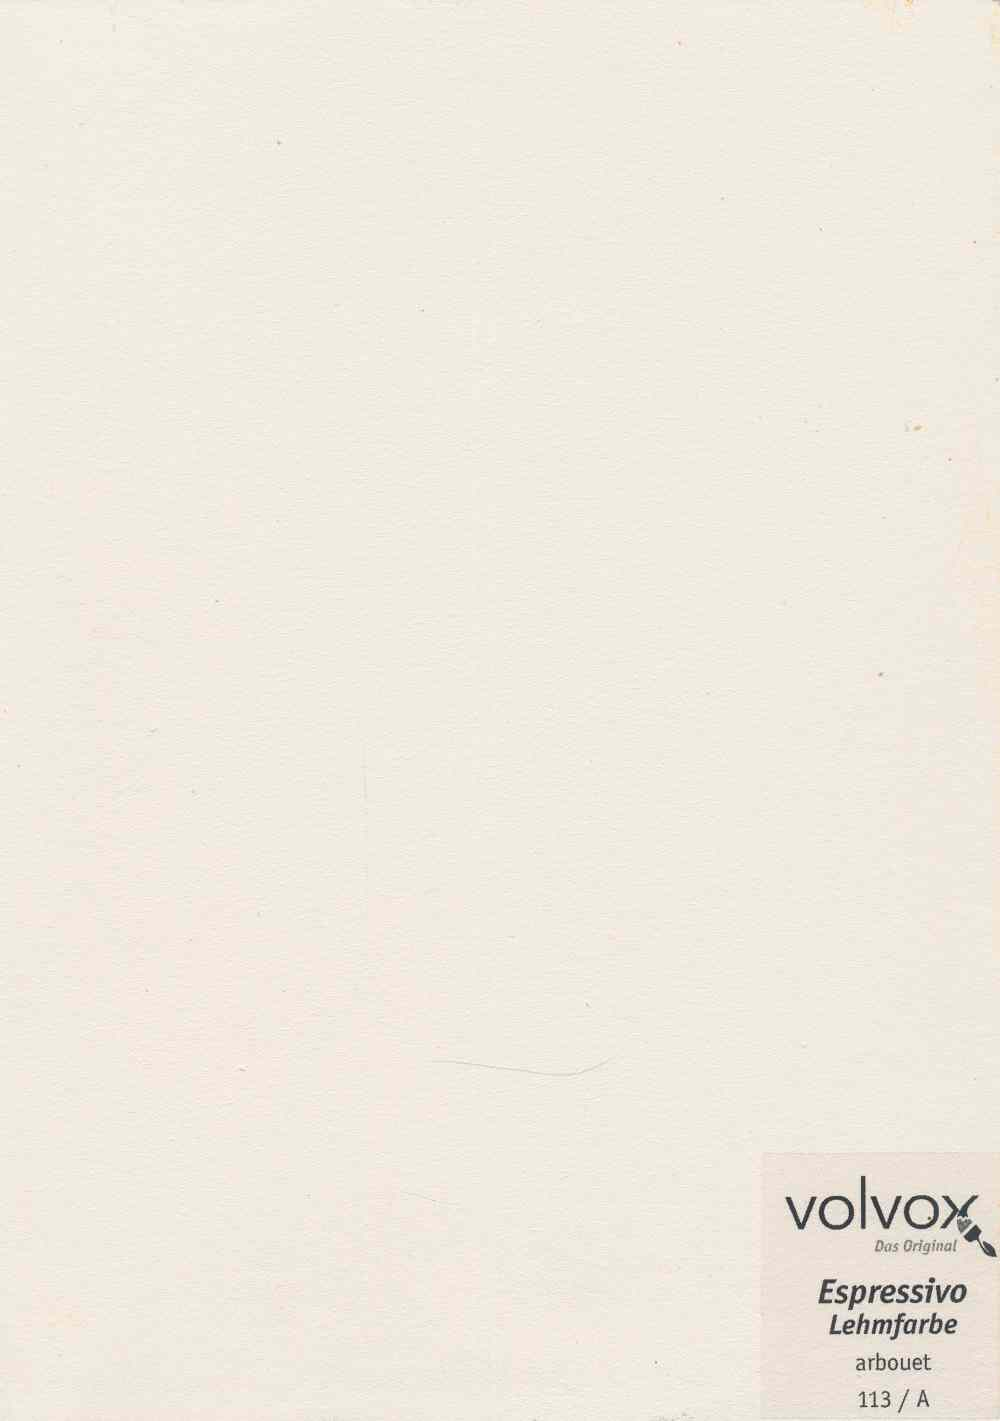 Volvox Espressivo Lehmfarbe 113 arbouet